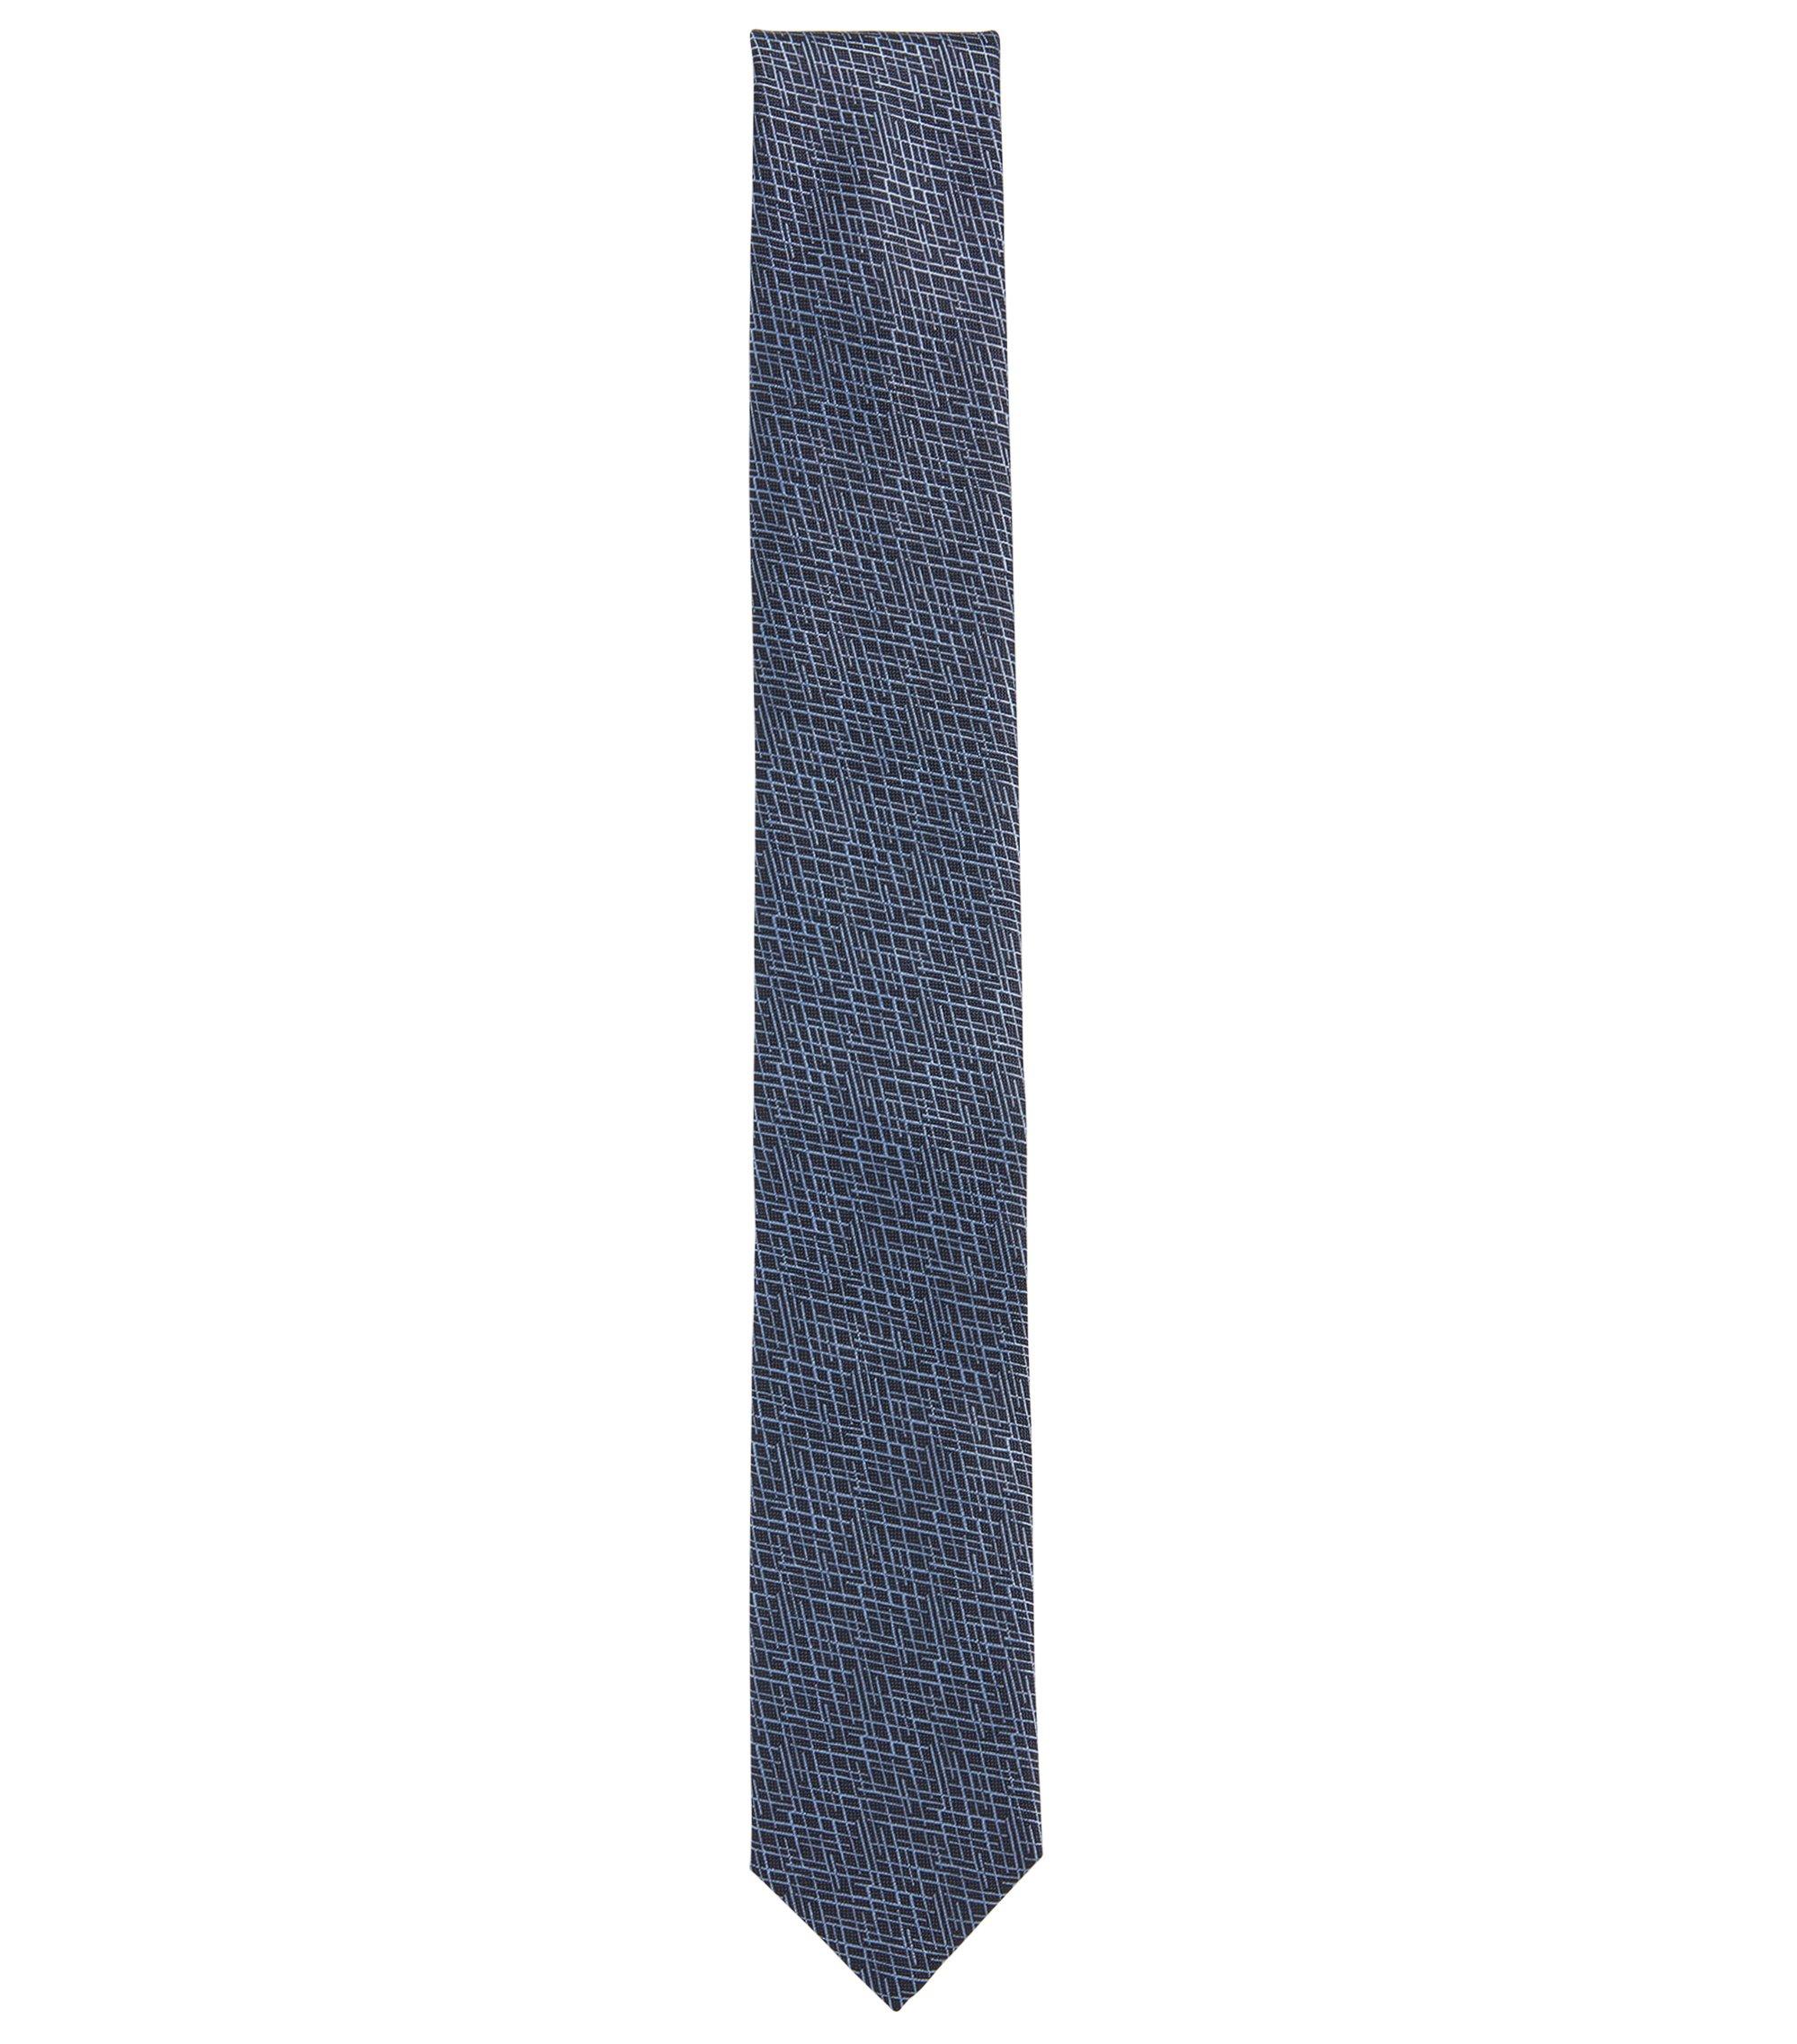 Krawatte aus Seiden-Jacquard mit abstraktem Muster, Dunkelblau